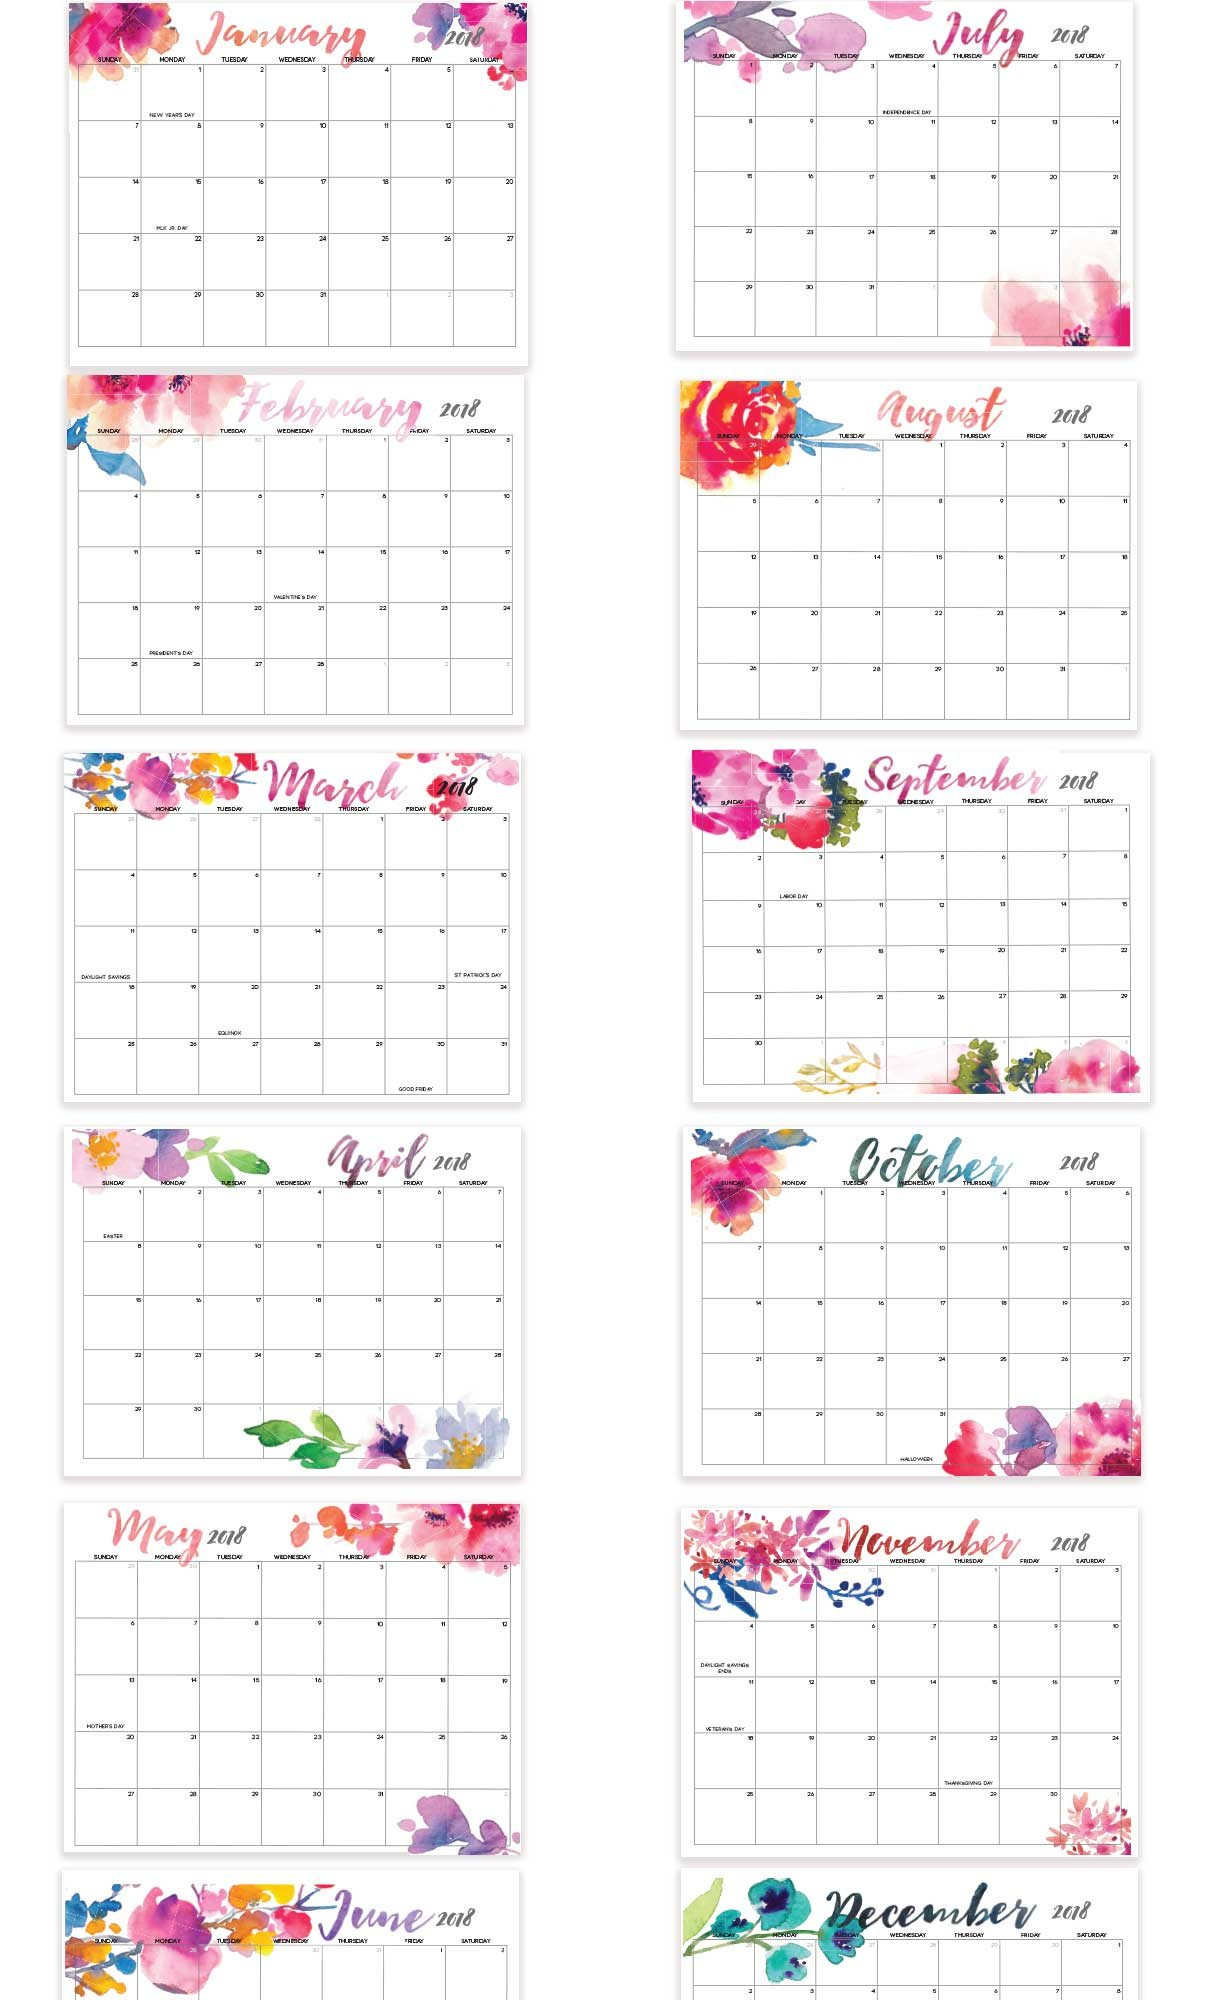 2019 Printable Calendar Editable 12 Month Letter Size   Etsy 12 Month Editable Calendar